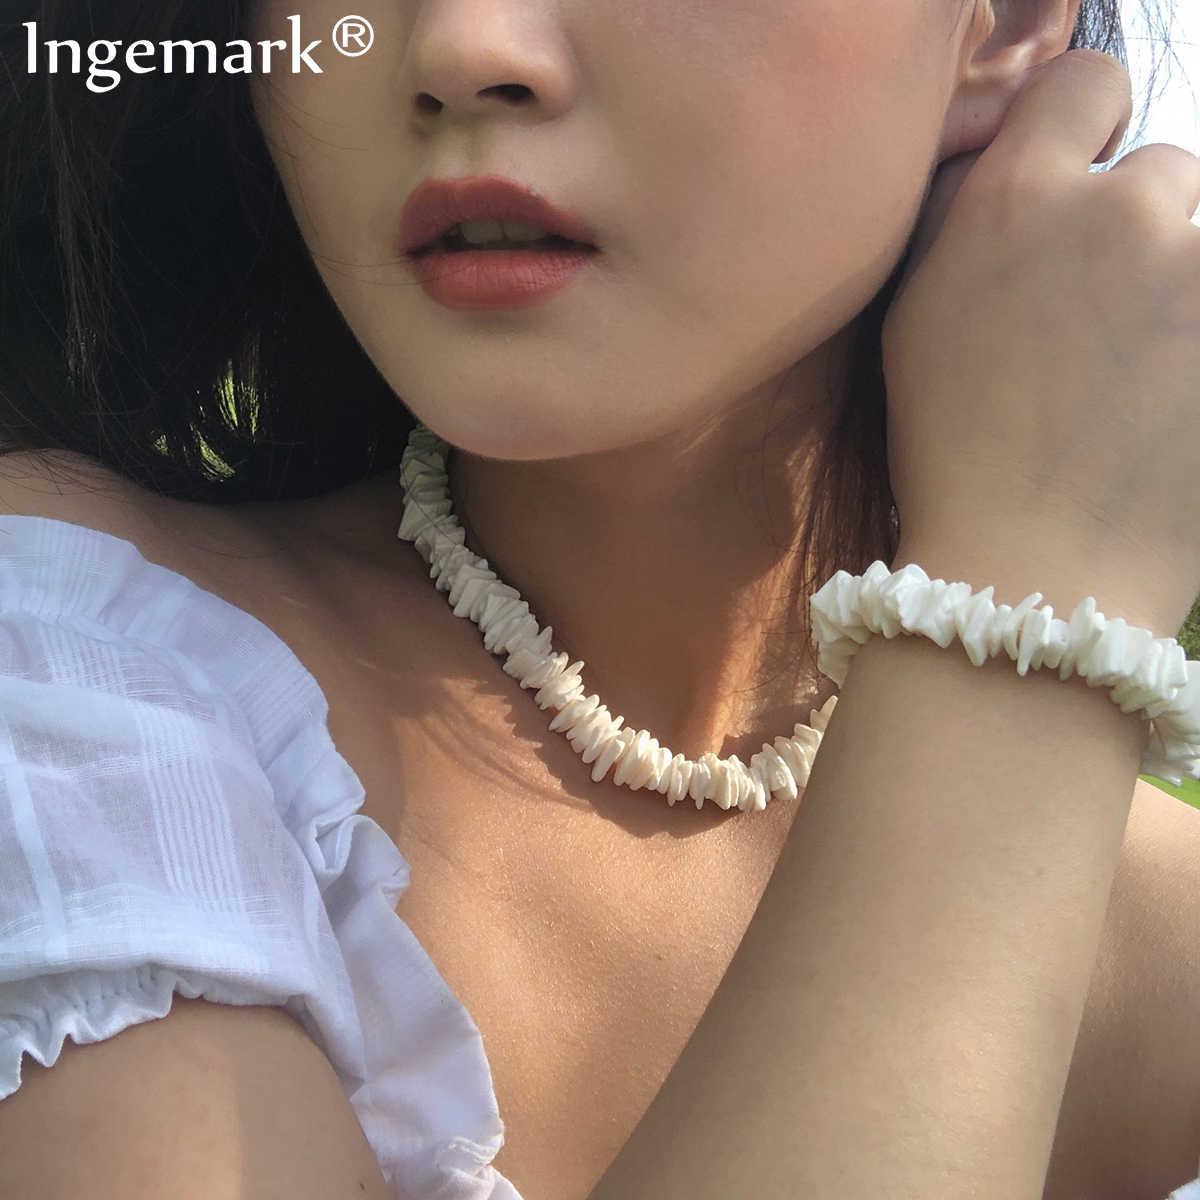 Ingemark הוואי Puka מעטפת קולר שרשרת NE + BA קוריאני לבן טבעי סדיר שבבי צדף צמיד עכס תכשיטי חתונה